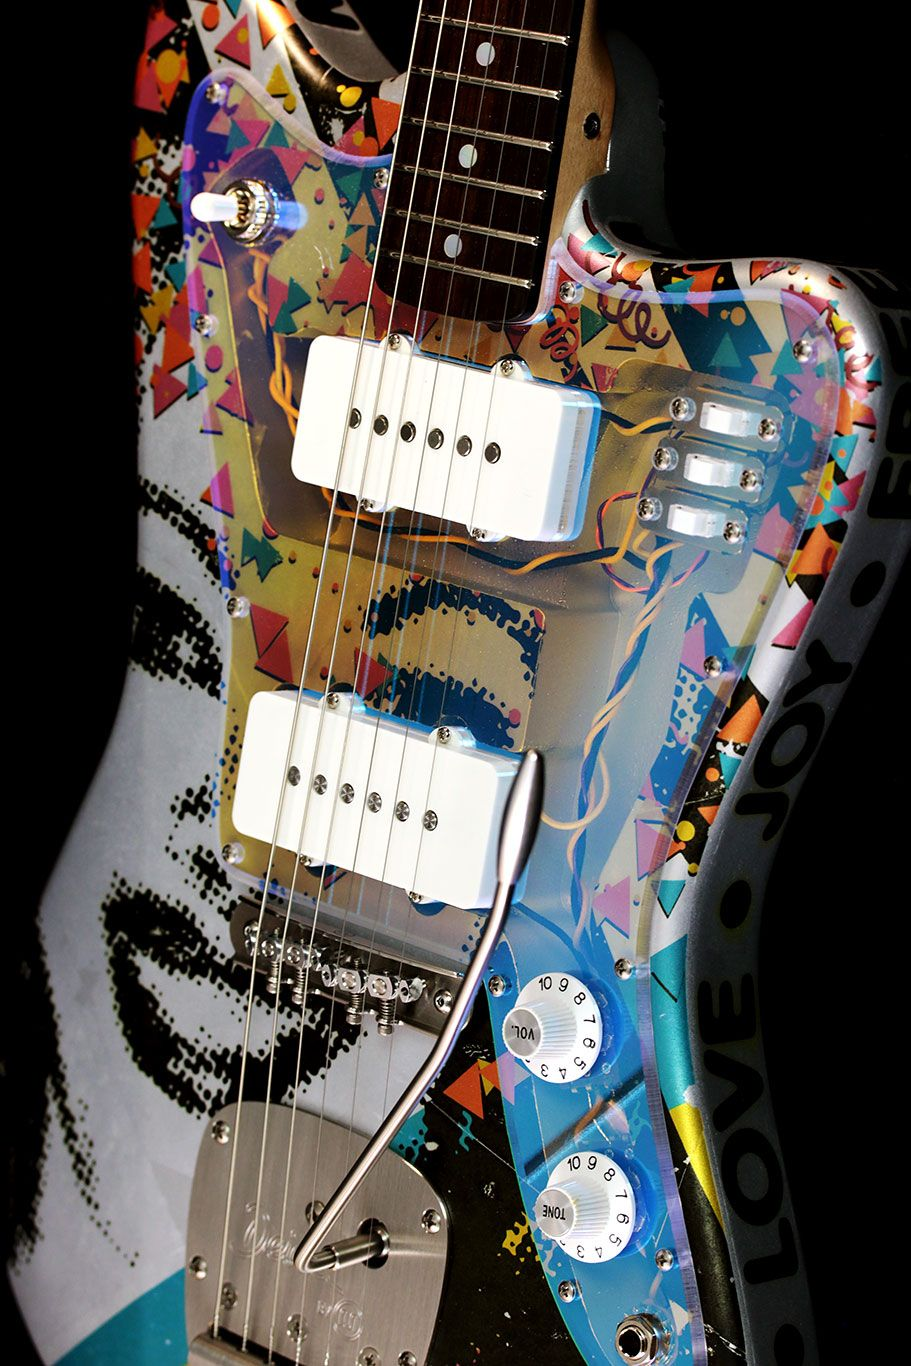 Deimel Firestar Artist Edition 20 Years 144 Guitar Design Play That Funky Music Cool Guitar